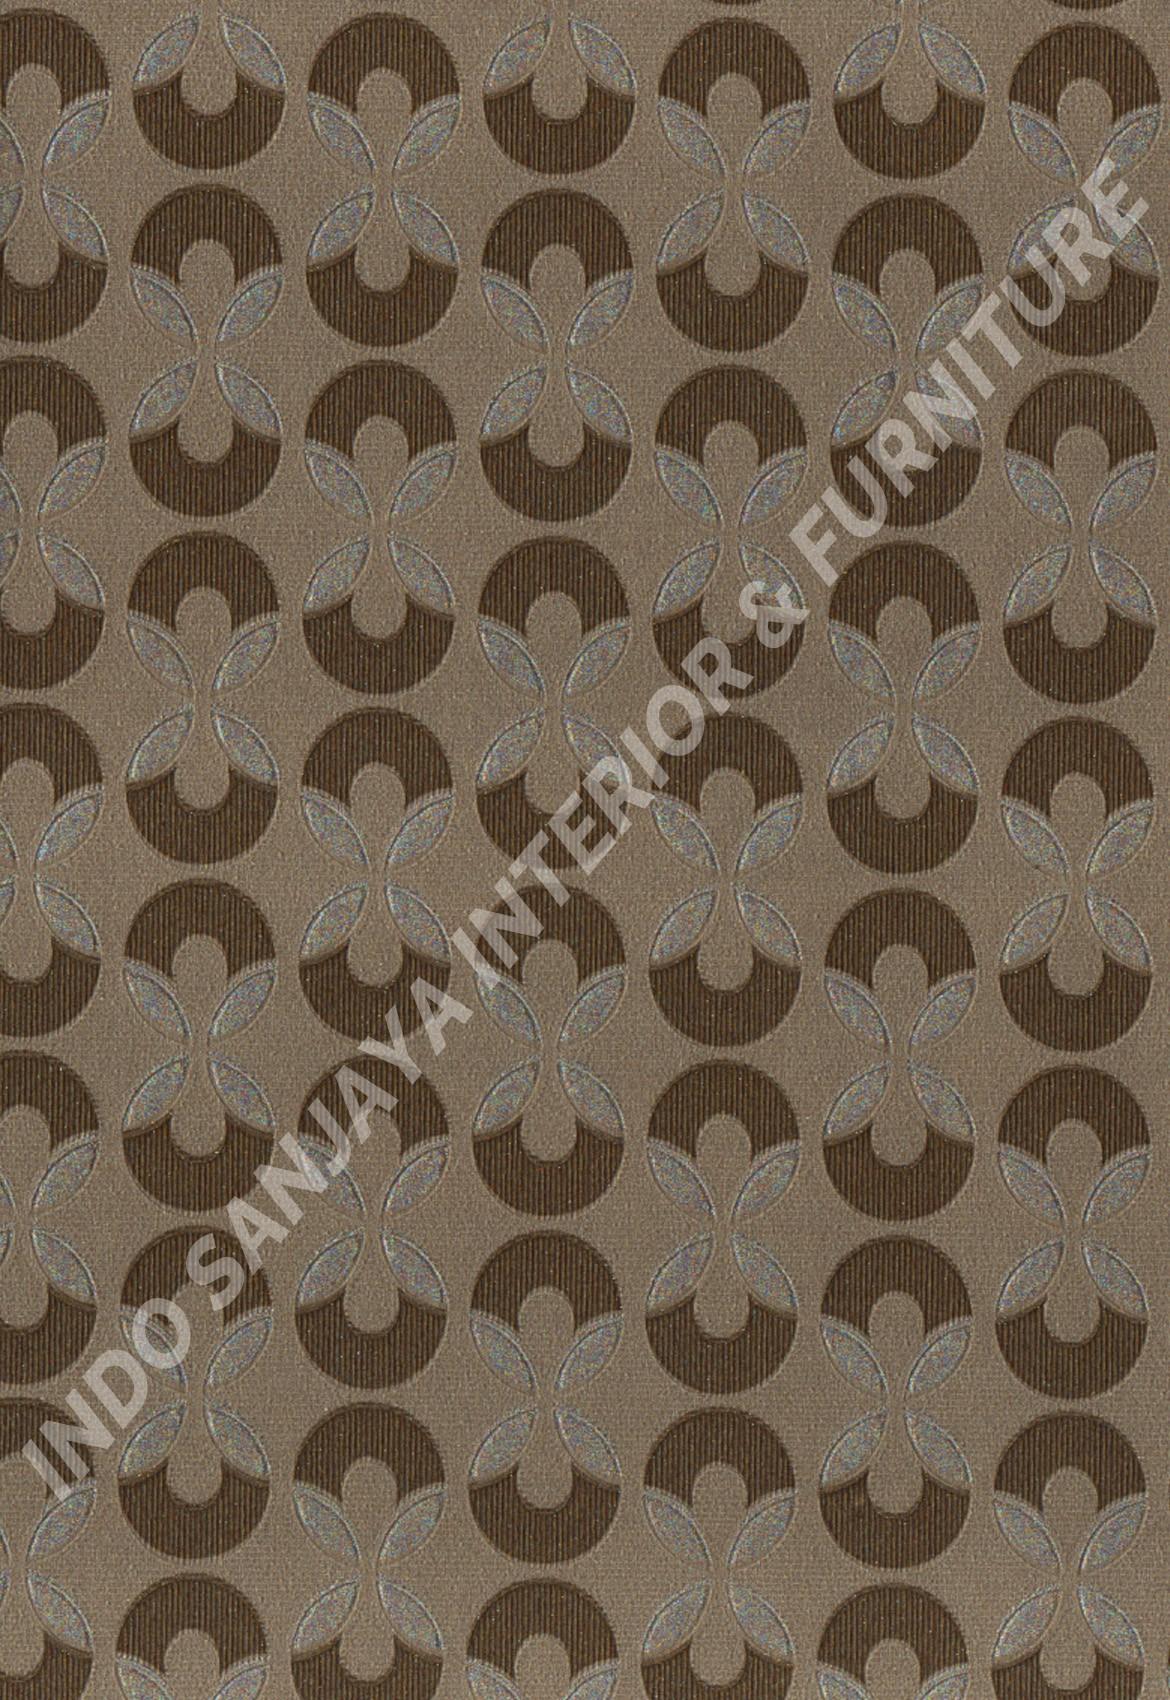 wallpaper   Wallpaper Minimalis Polos E11309:E11309 corak  warna